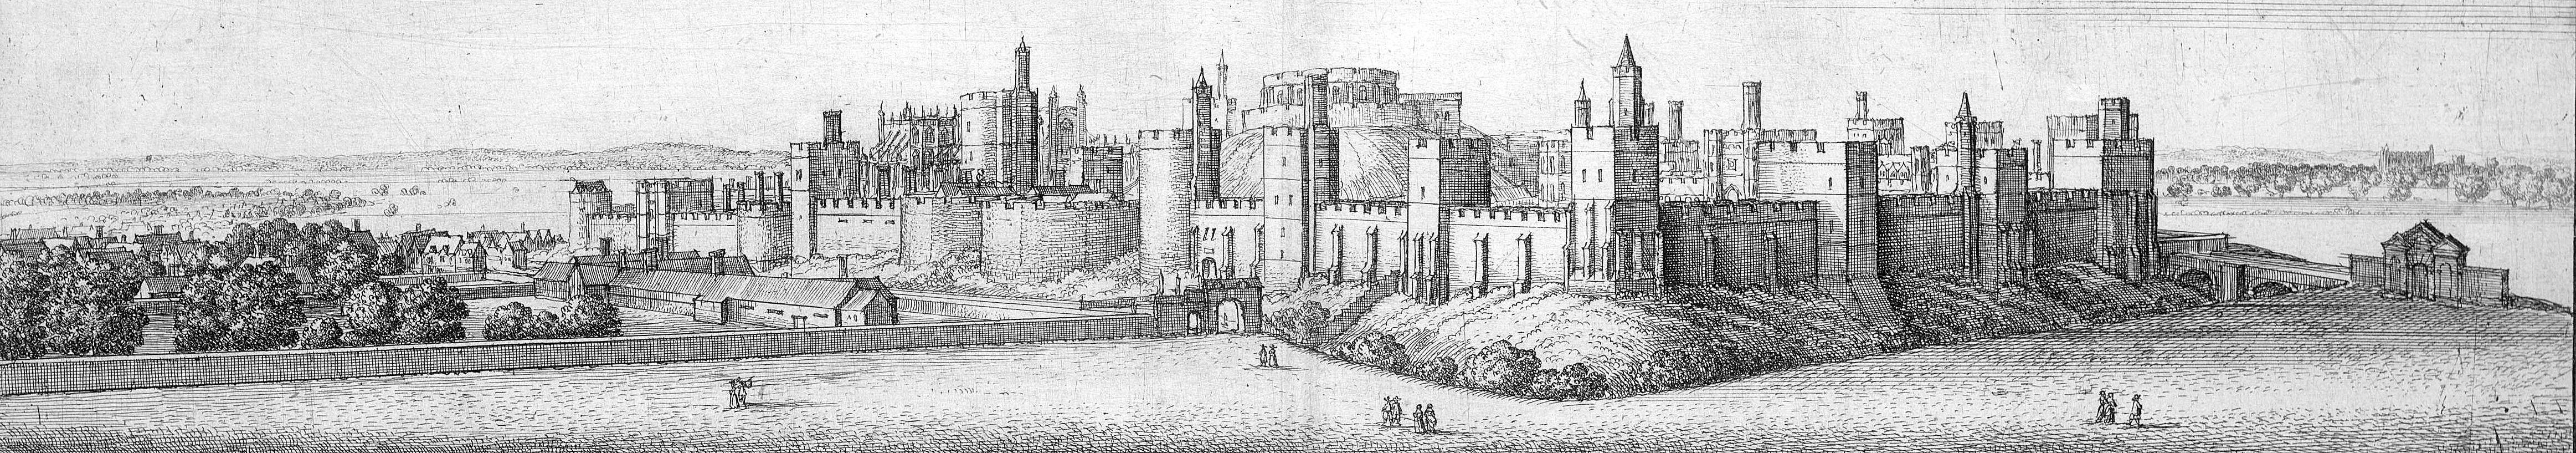 Windsor Castle Familypedia